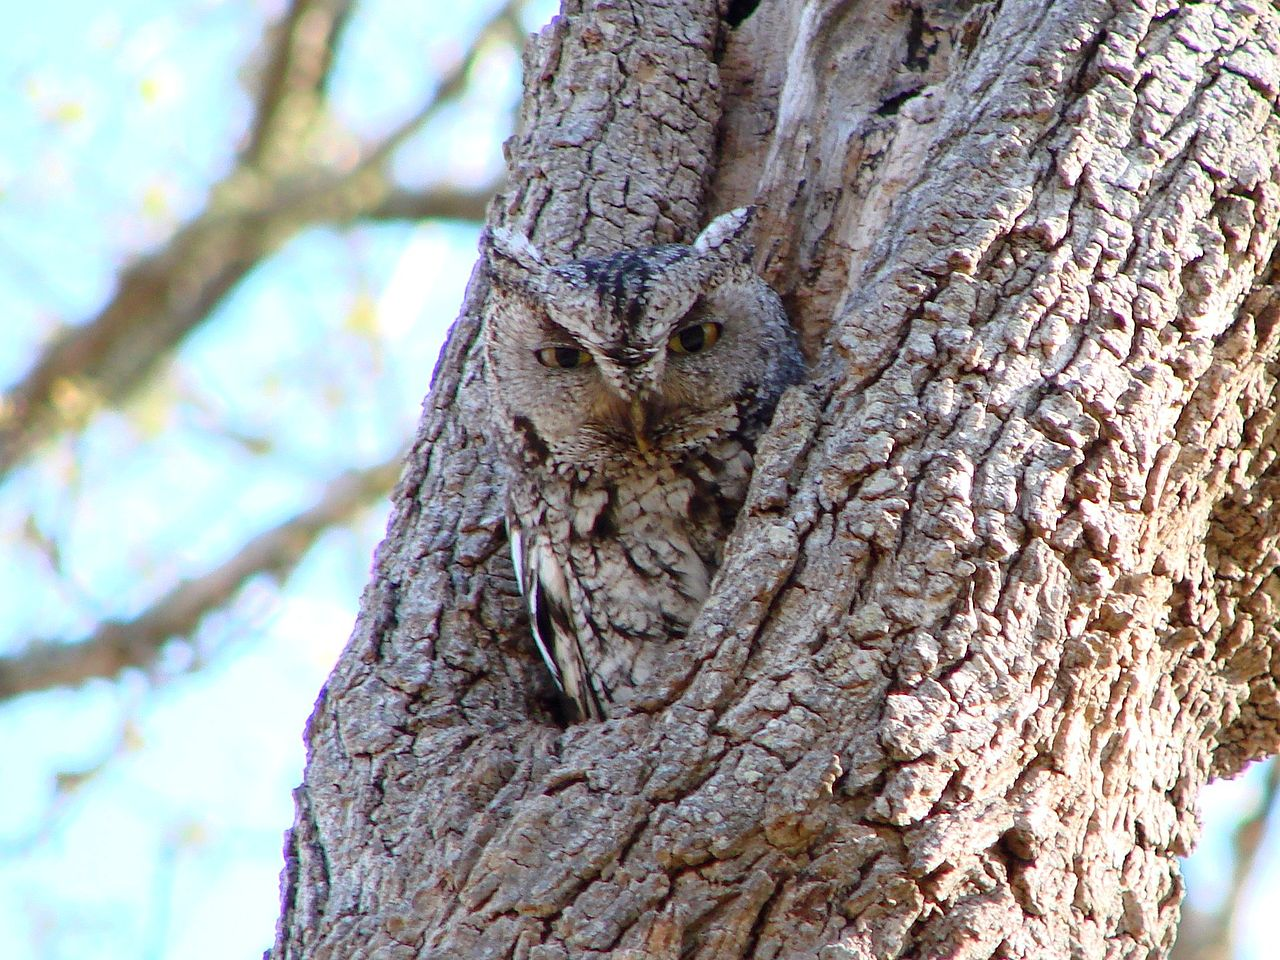 Eastern Screech Owl, Grey Morph (Megascops asio)